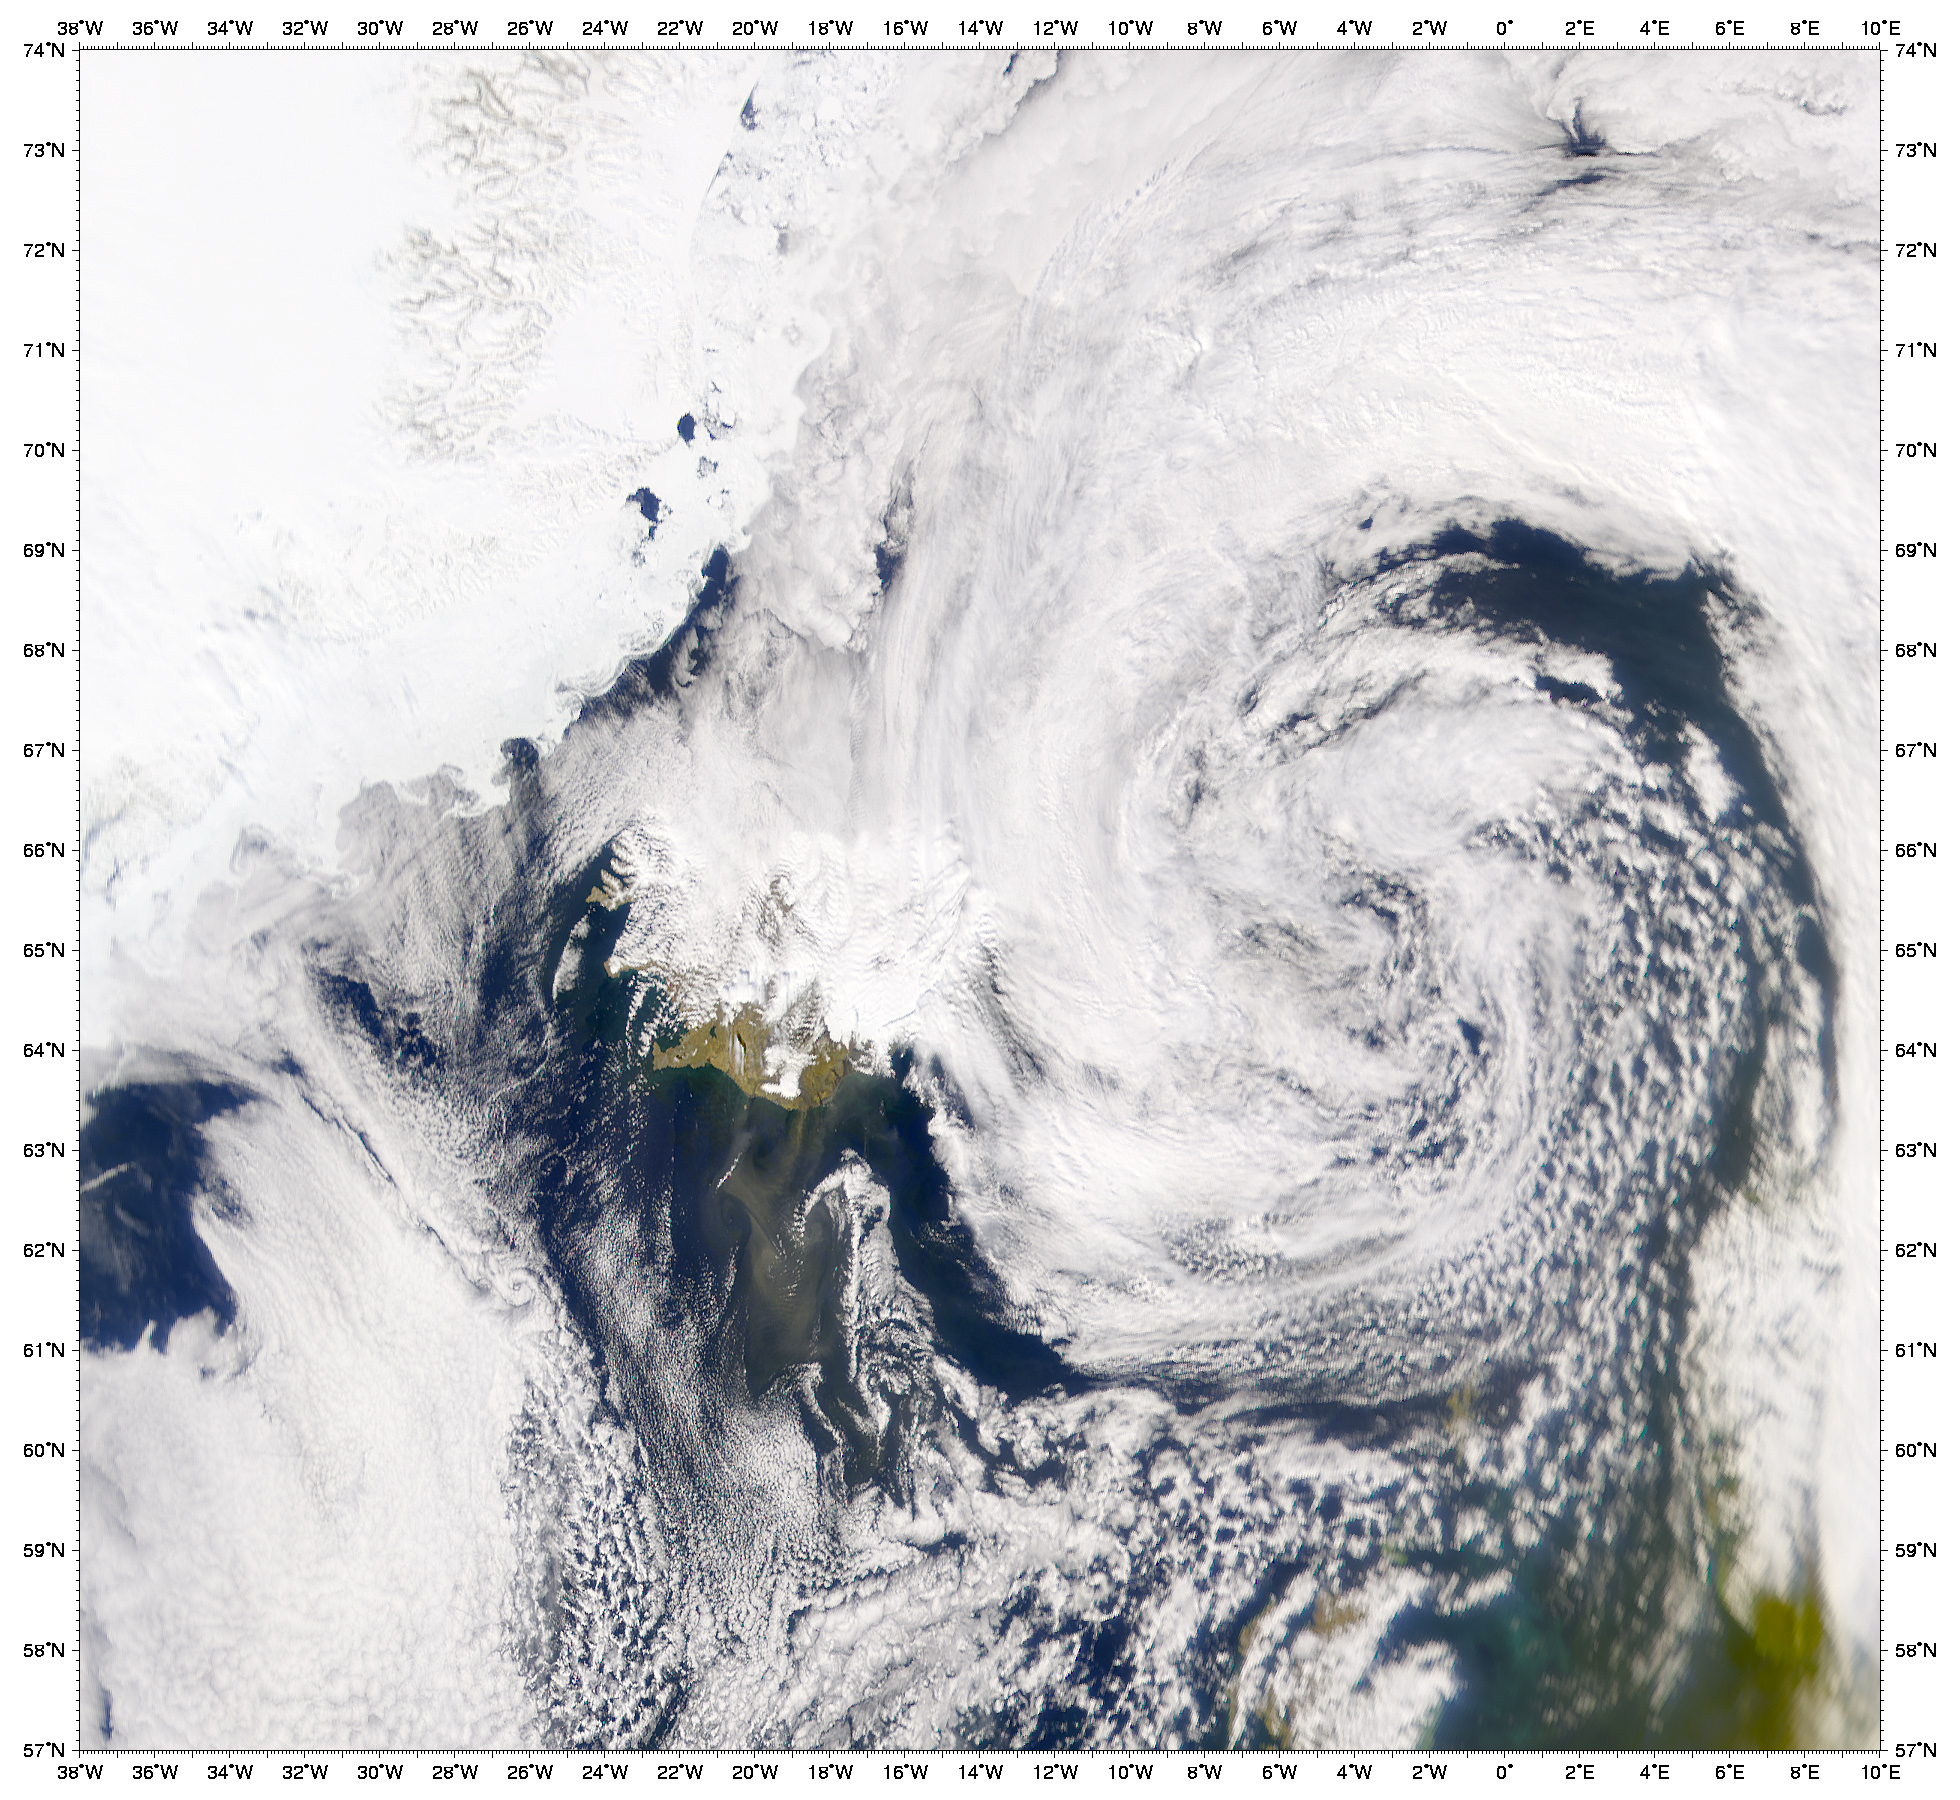 Tormenta de polvareda cerca de la costa meridional de Islandia